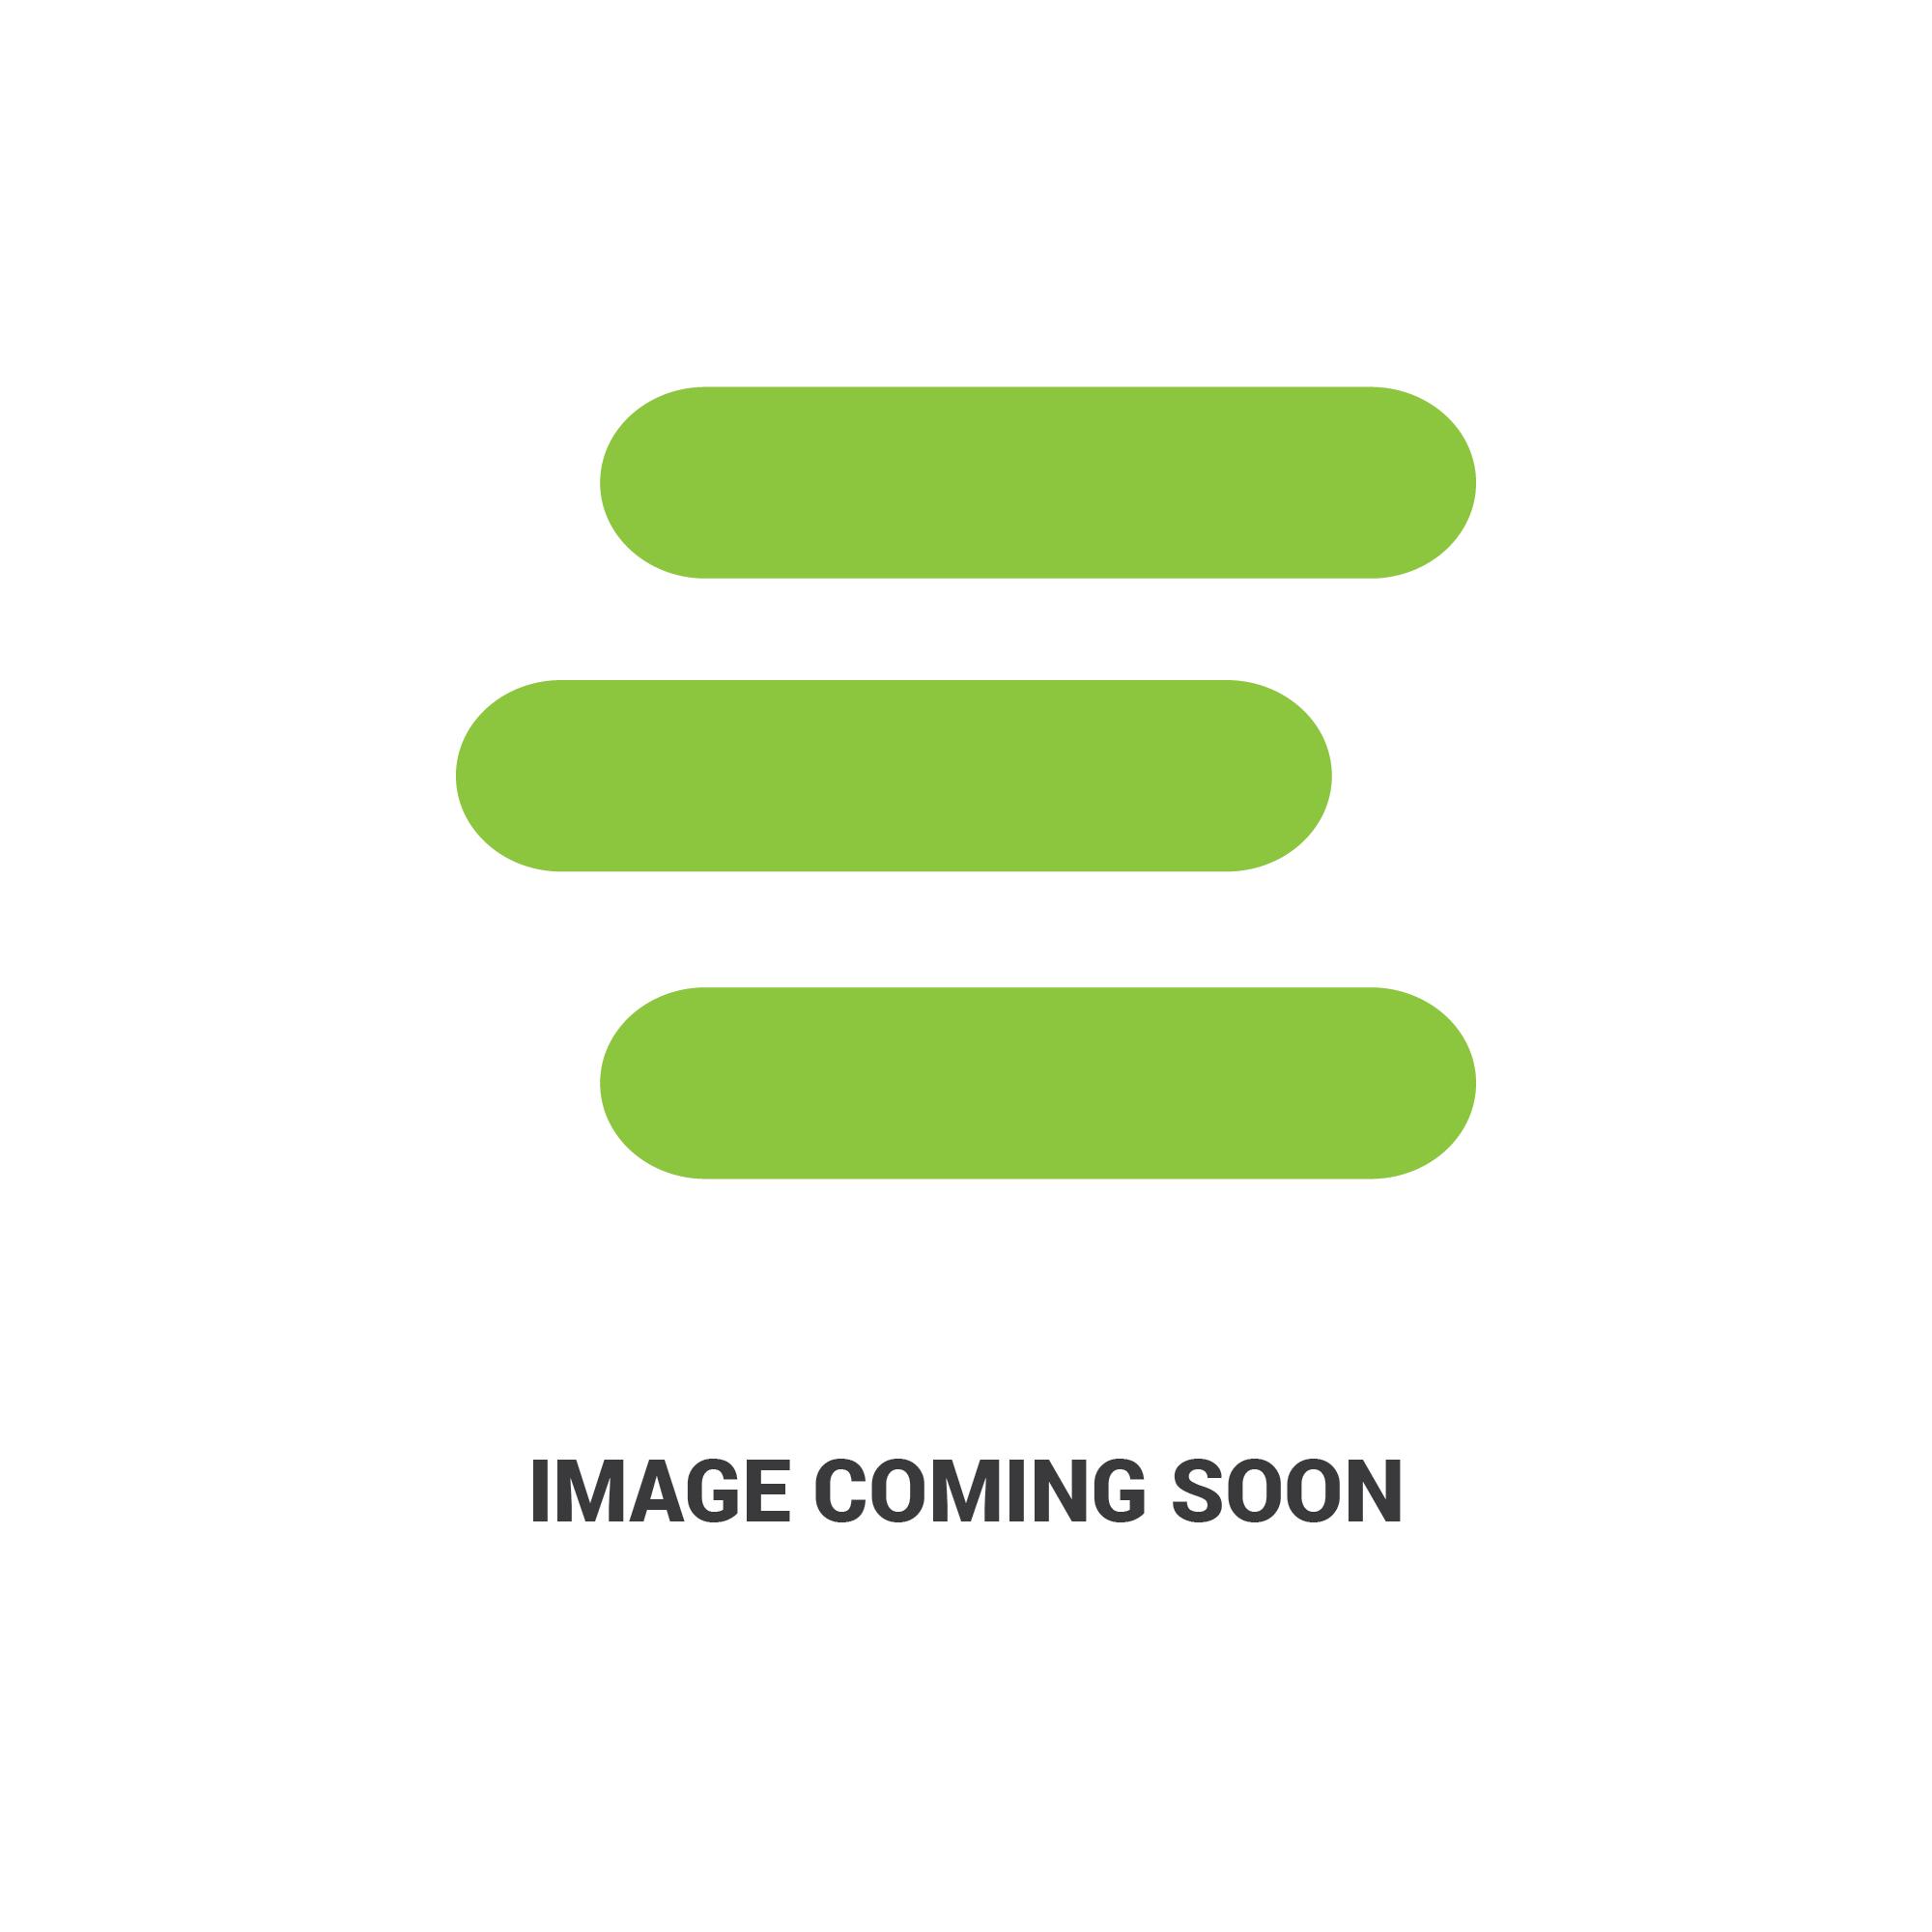 E-6975521430_1.jpg